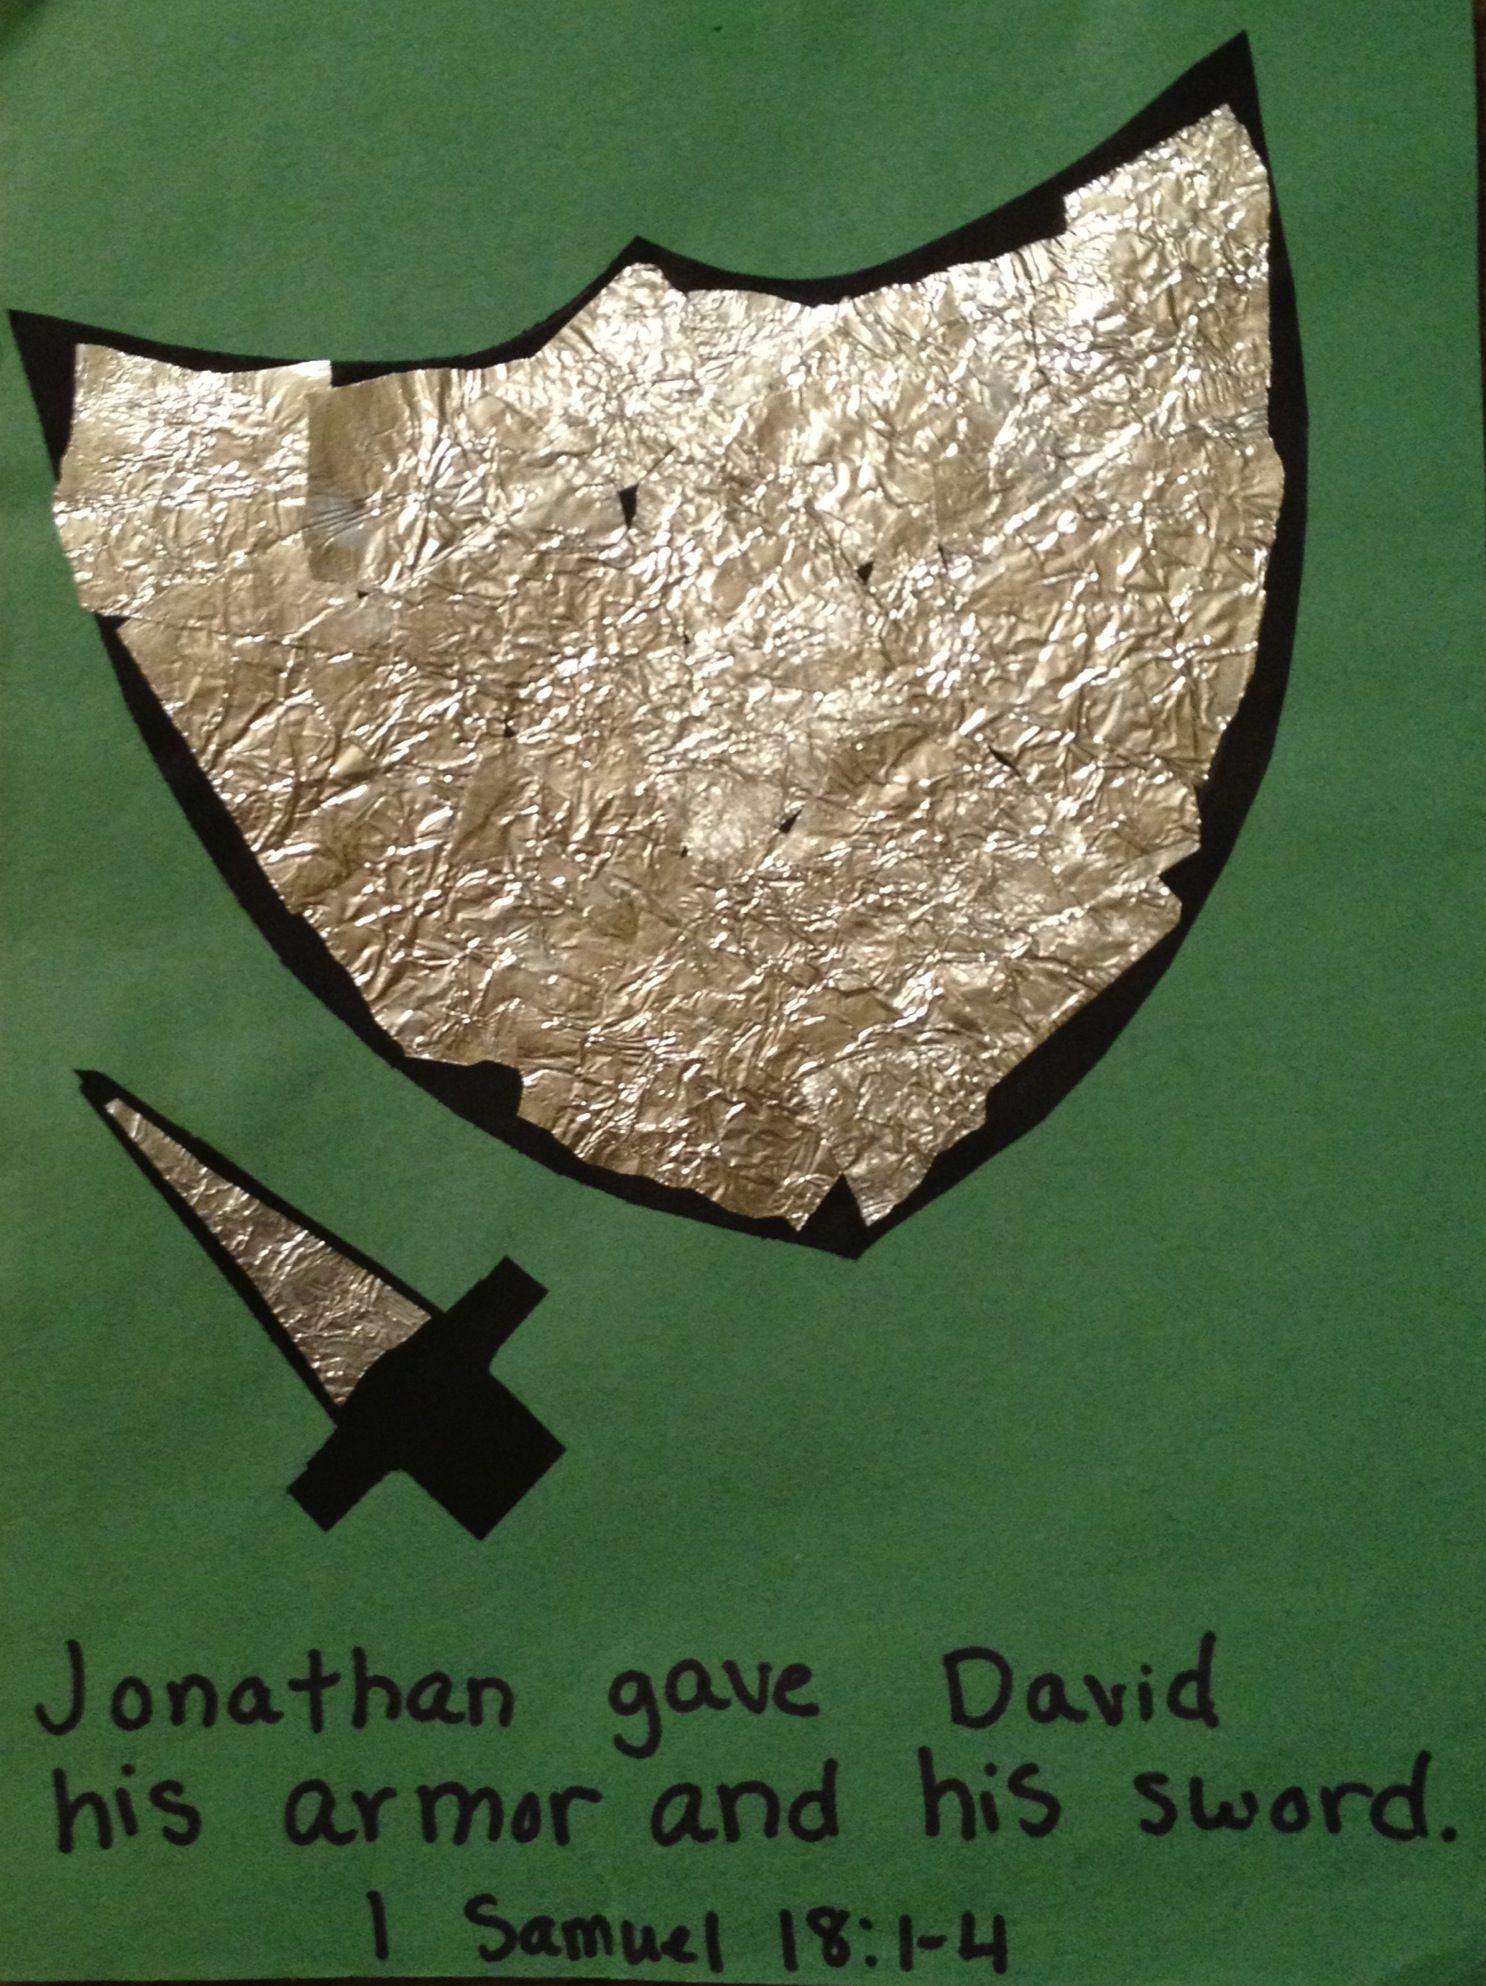 Old sunday school crafts jonathan david 1 samuel 18 1 for David and jonathan friendship craft